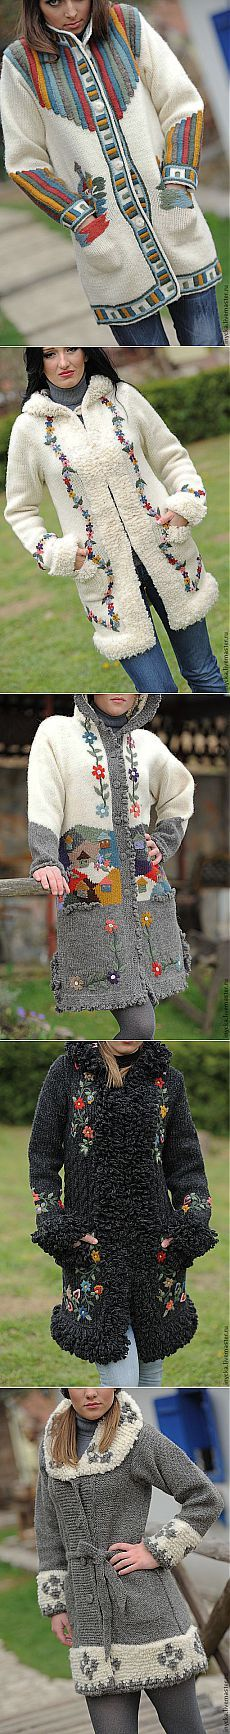 "Вязаные пальто. Мастерская ""WOOL-ART"", Сербия."